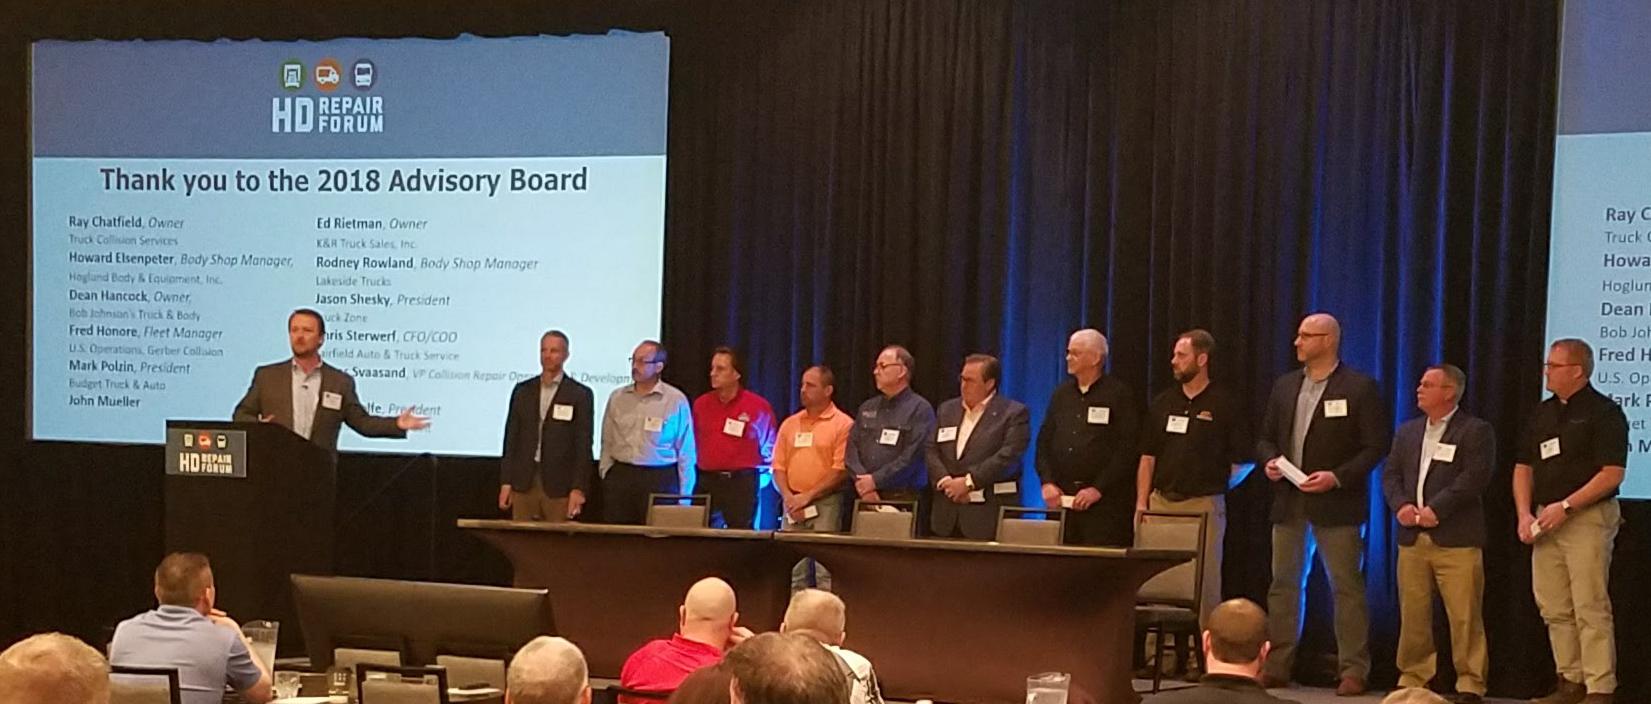 The HD Repair Forum Announces Advisory Board for 2018-2019